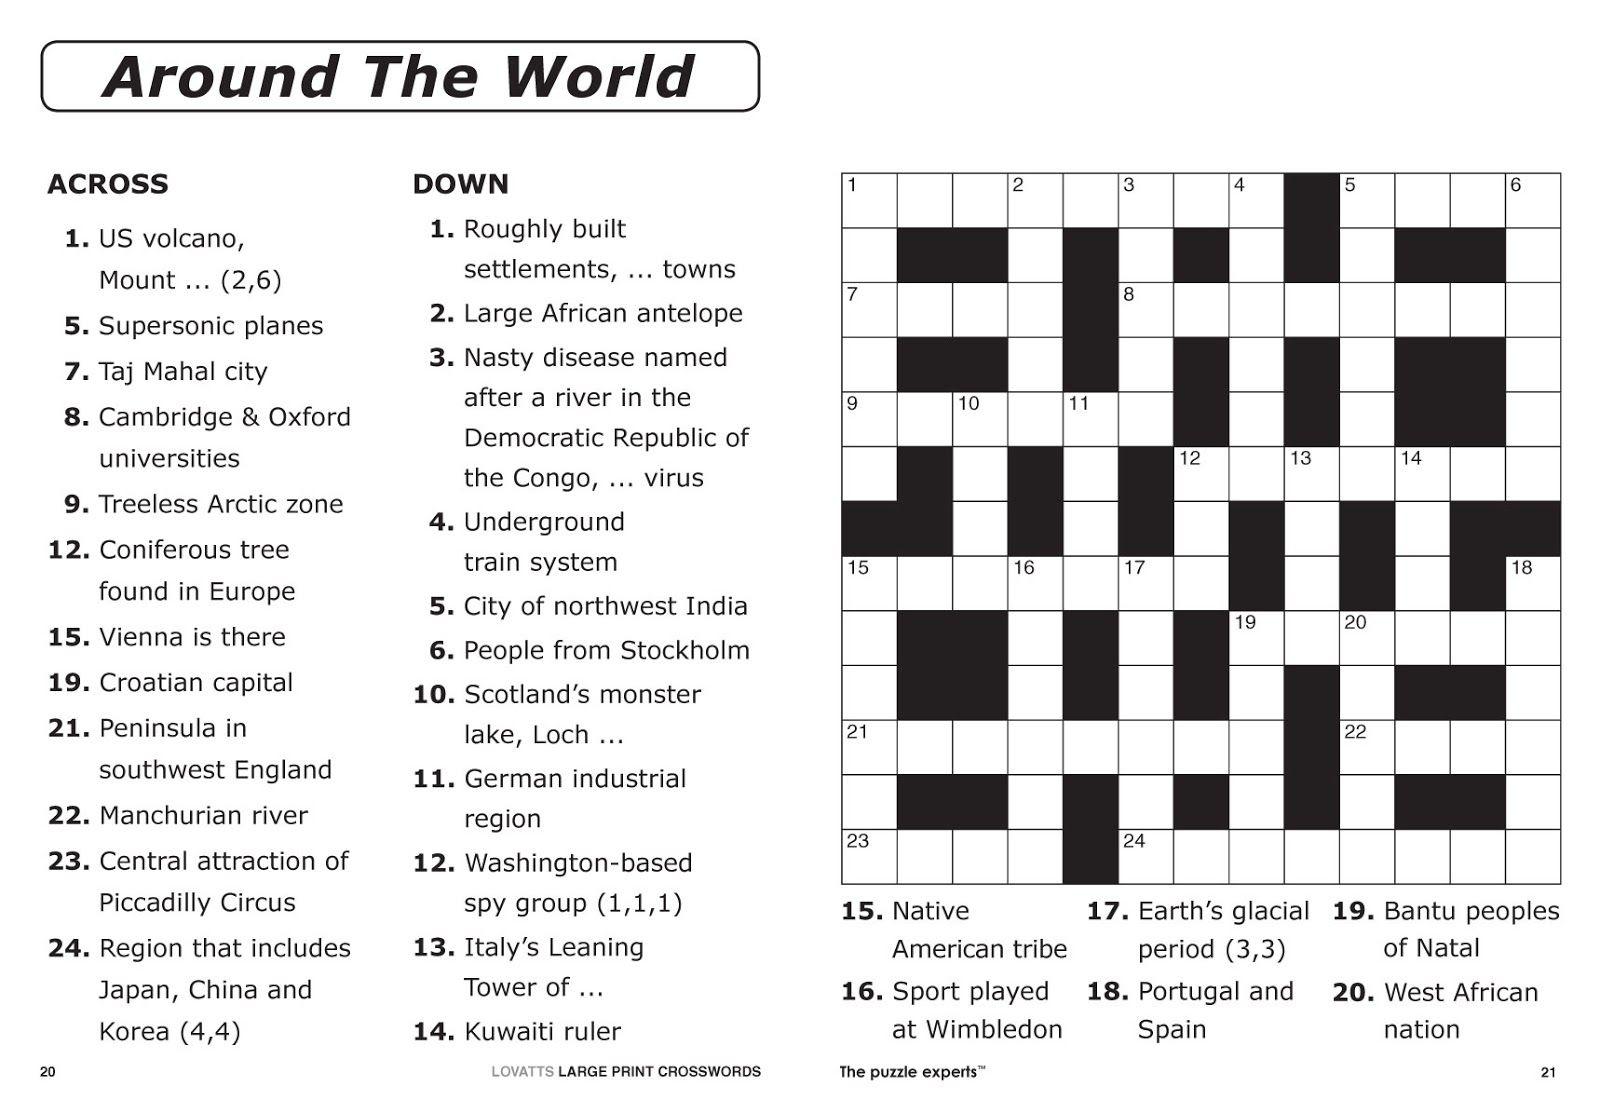 Easy Printable Crossword Puzzles | Elder Care & Dementia Care - Free - Printable Crossword Puzzles.com